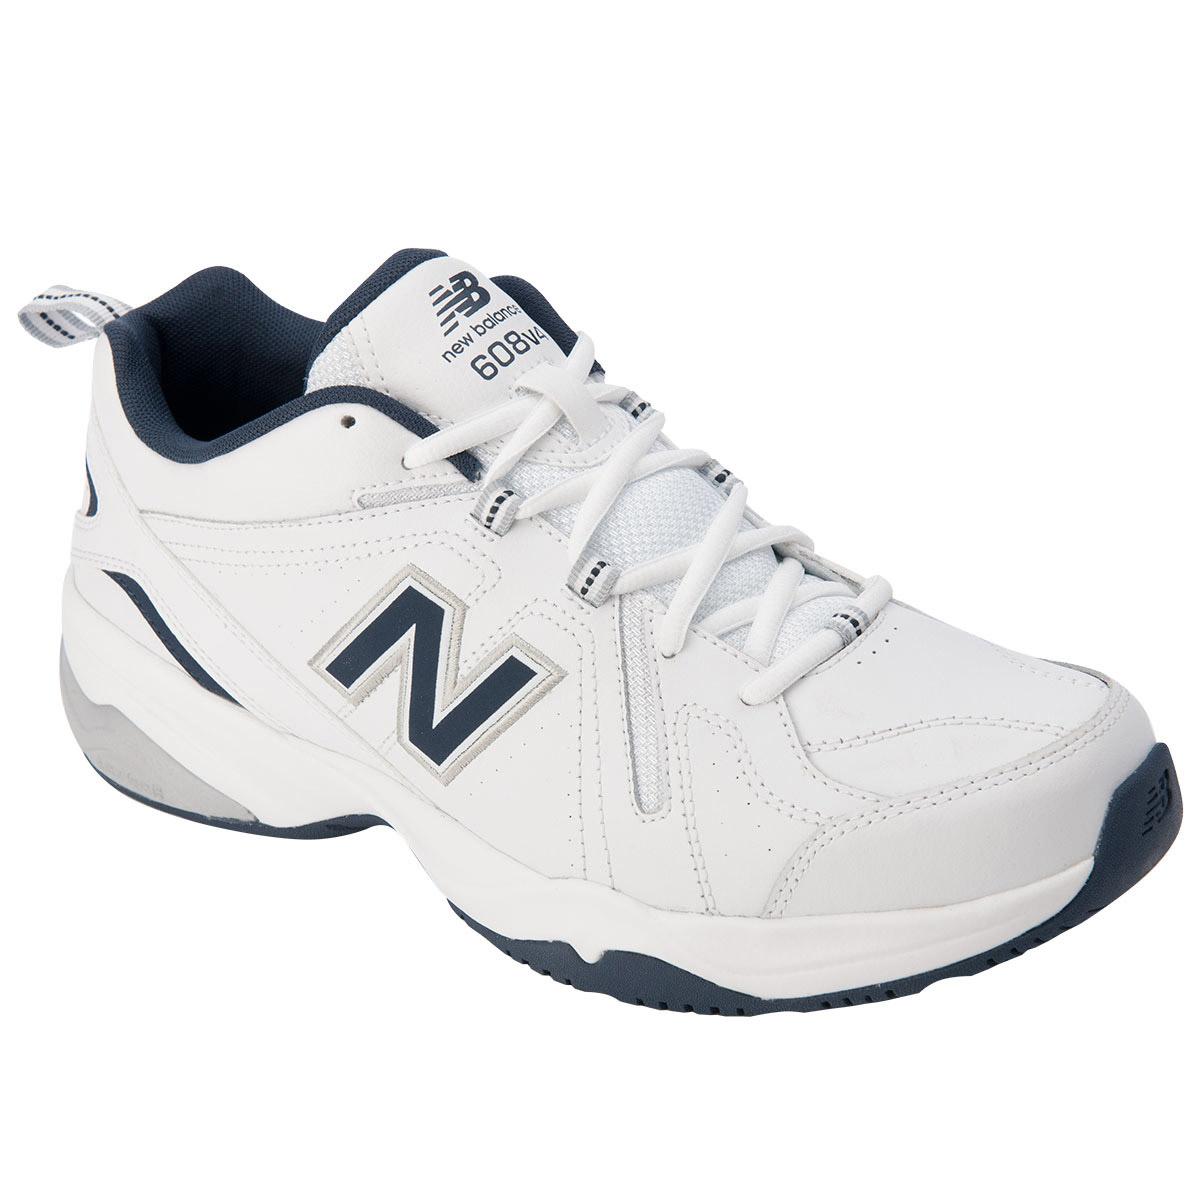 NEW BALANCE Men's 608v4 Sneakers, 4E